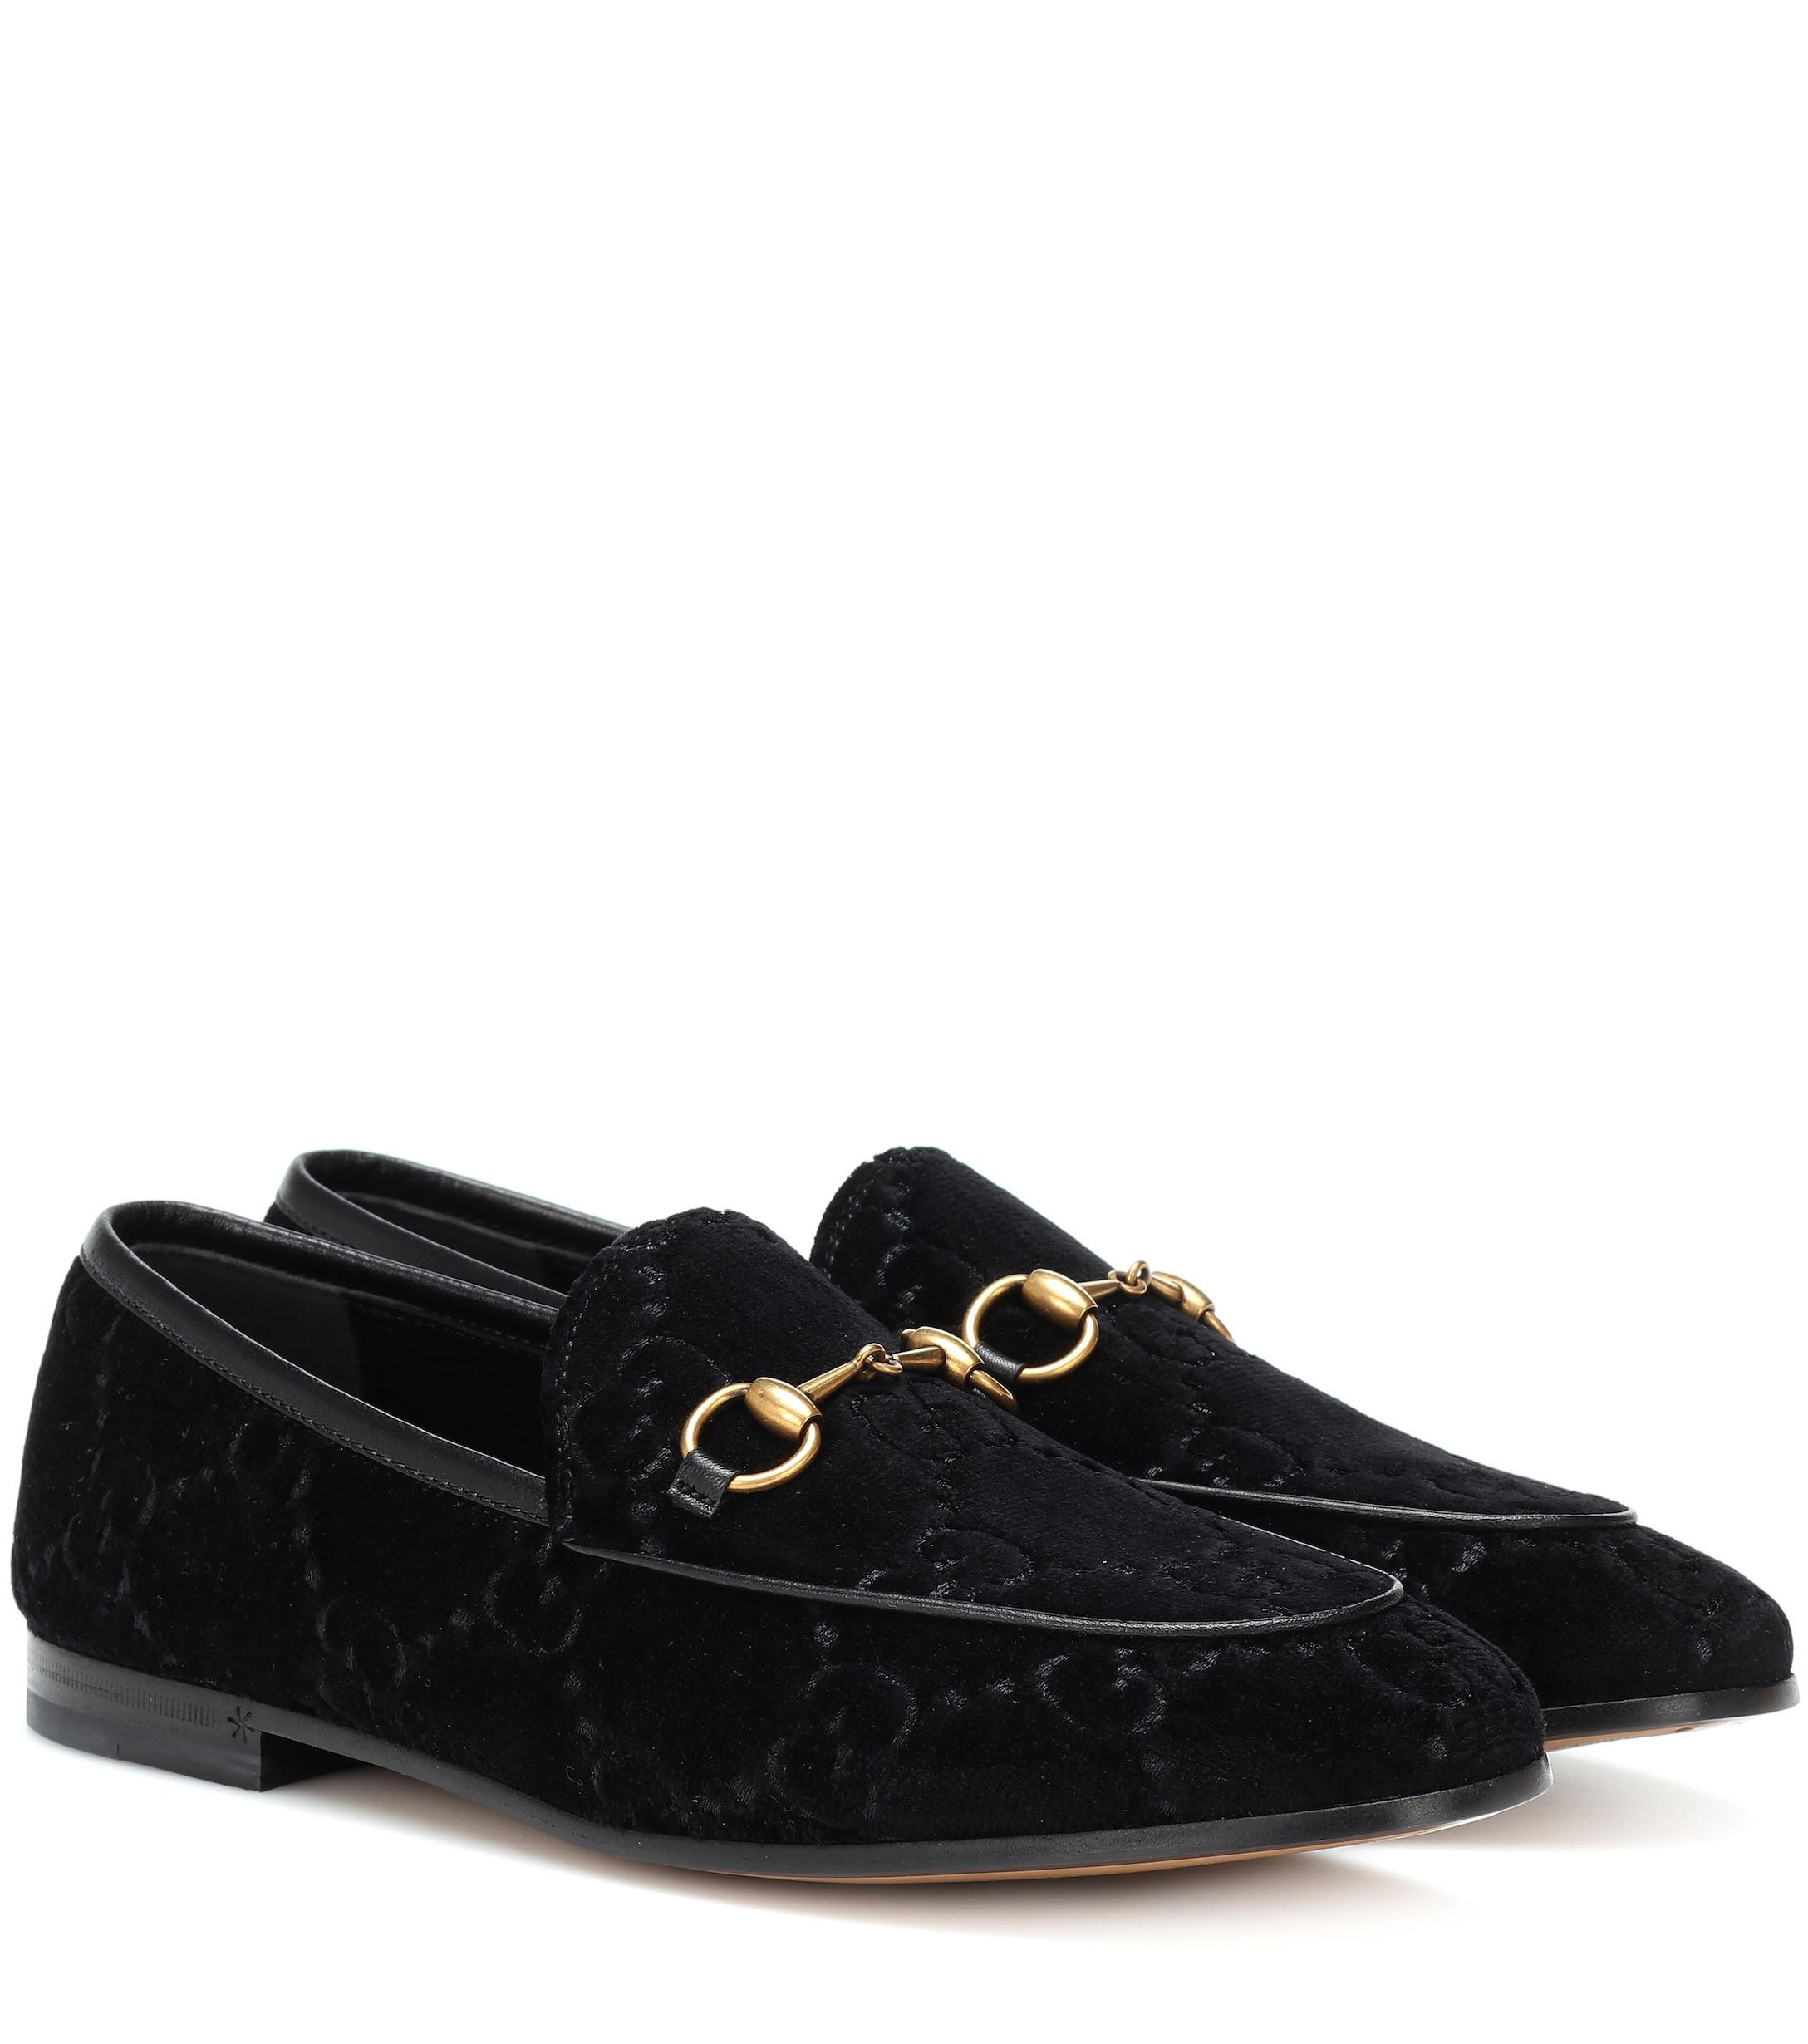 404c8b655d9 Gucci Jordaan GG Velvet Loafers in Black - Lyst